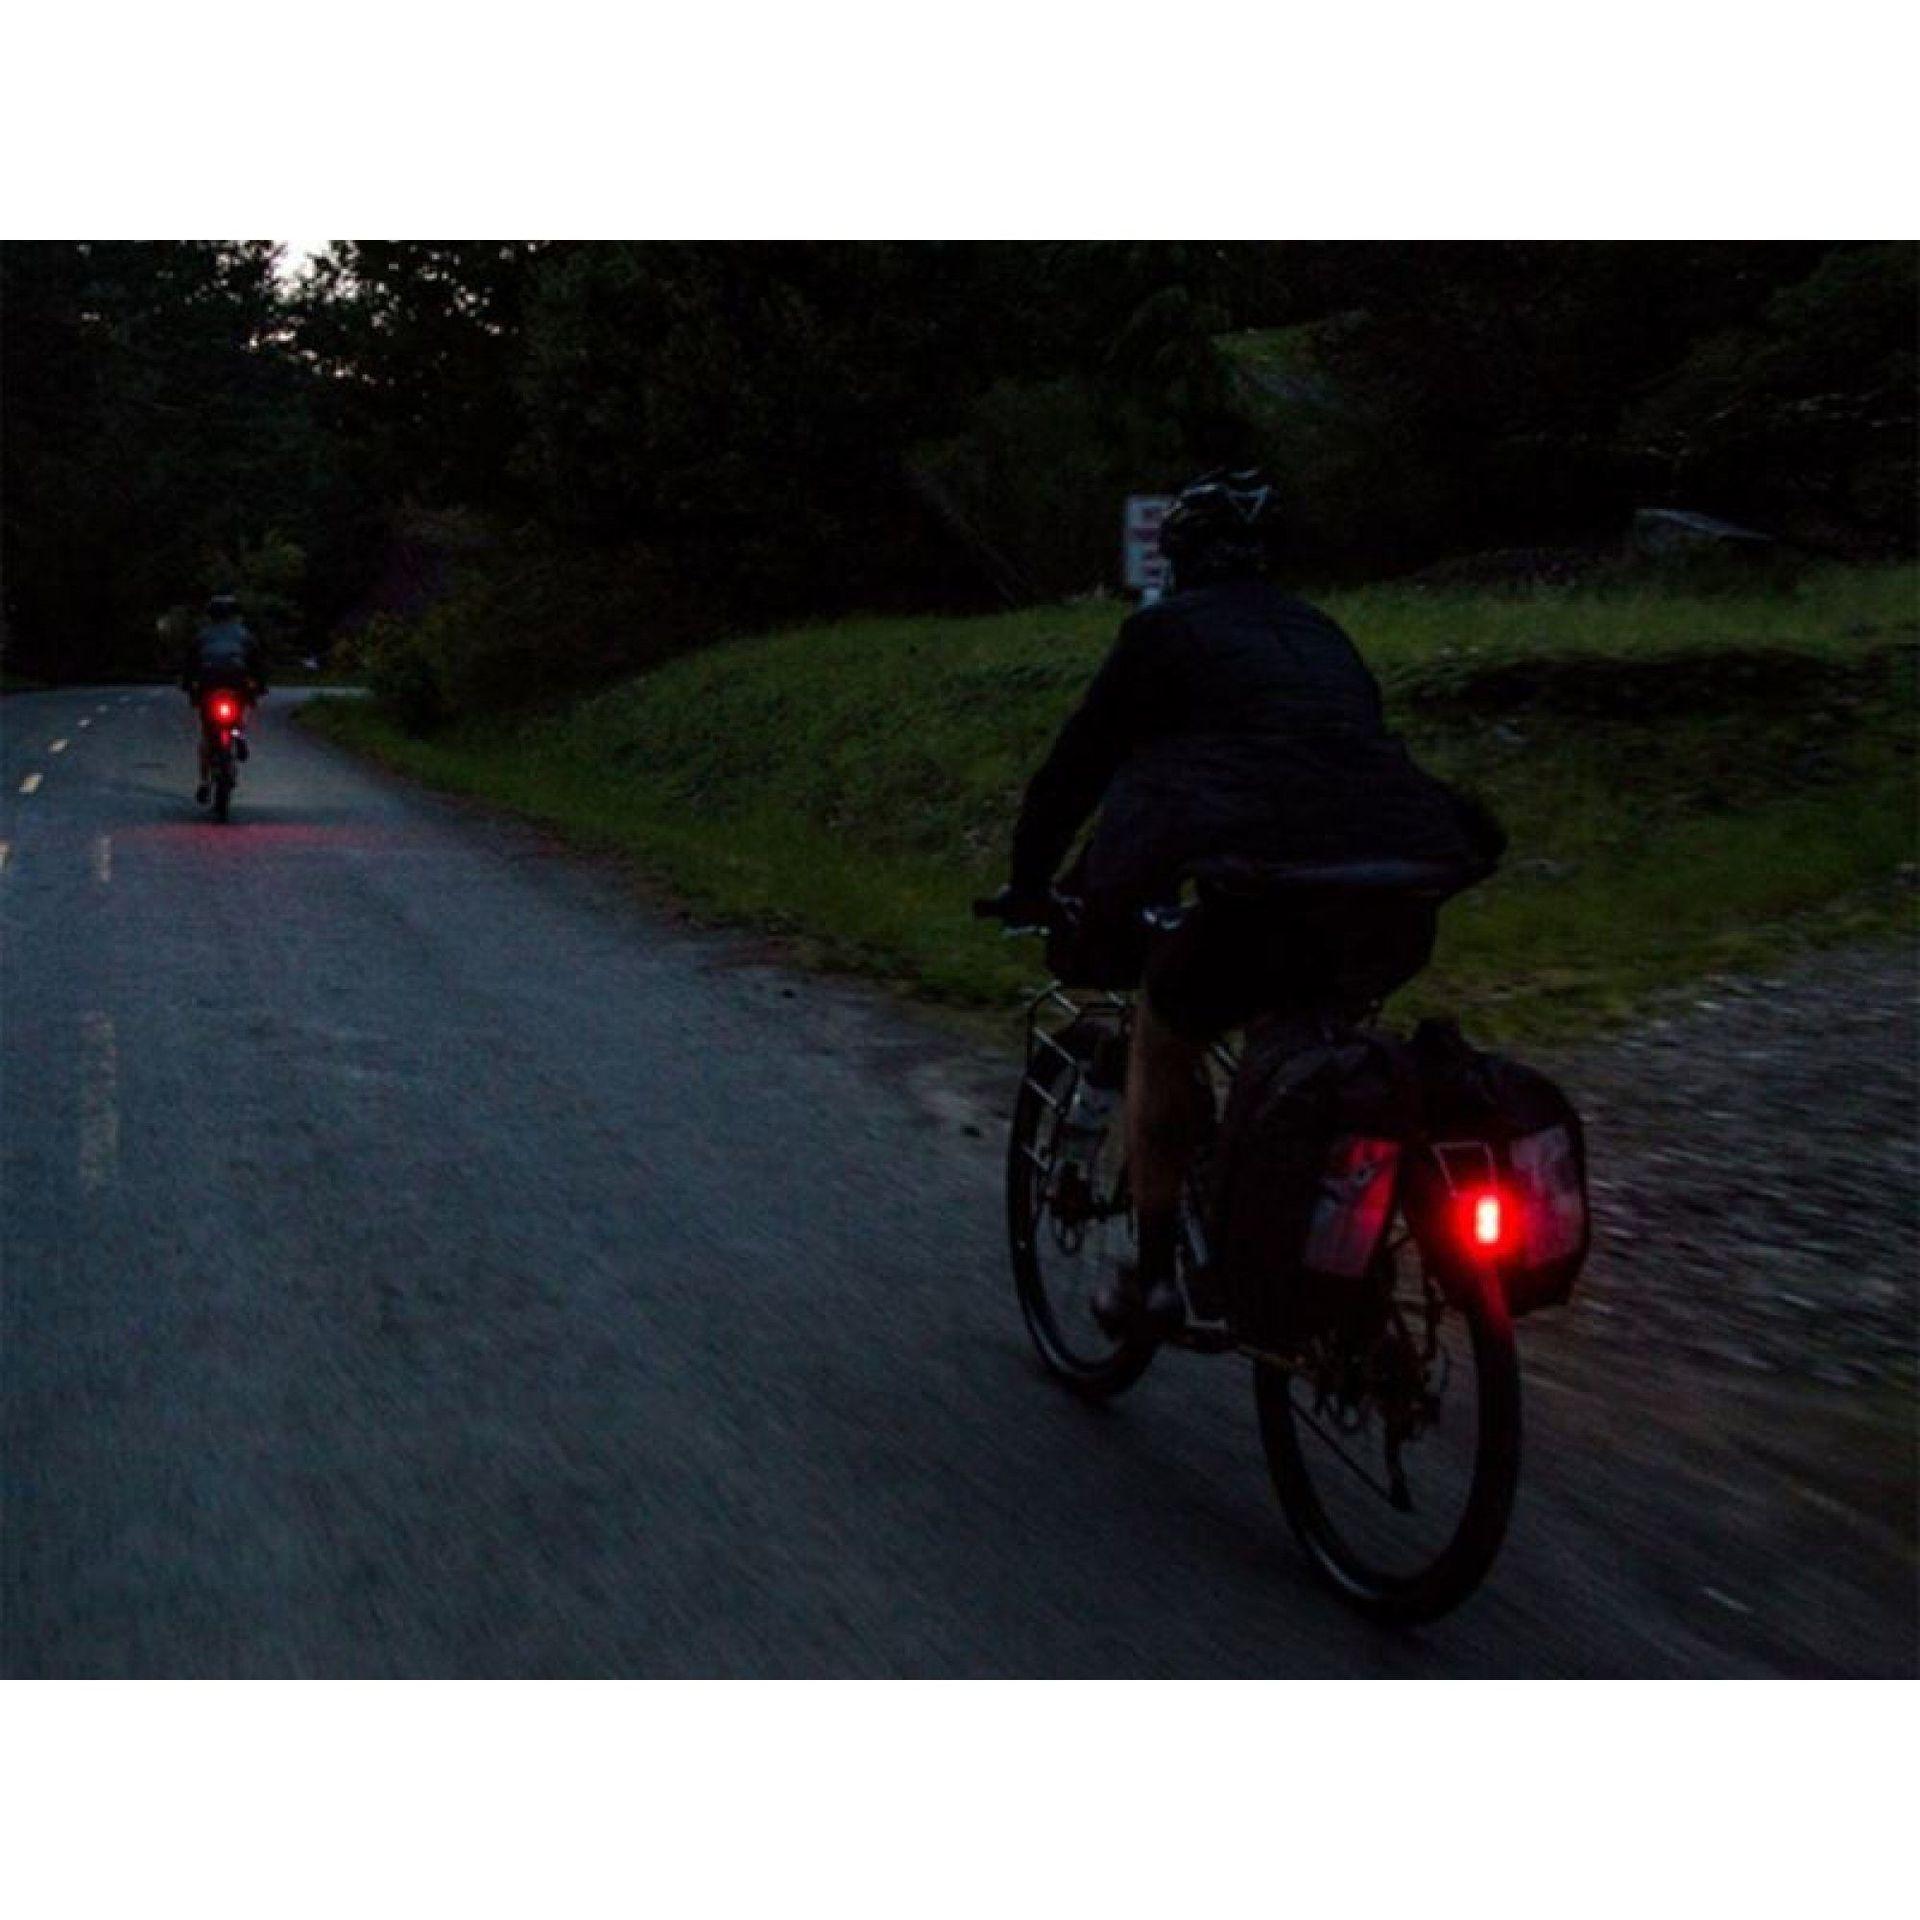 LAMPKA ROWEROWA TYLNA BLACKBURN LOCAL REAR 15 CZARNY 3